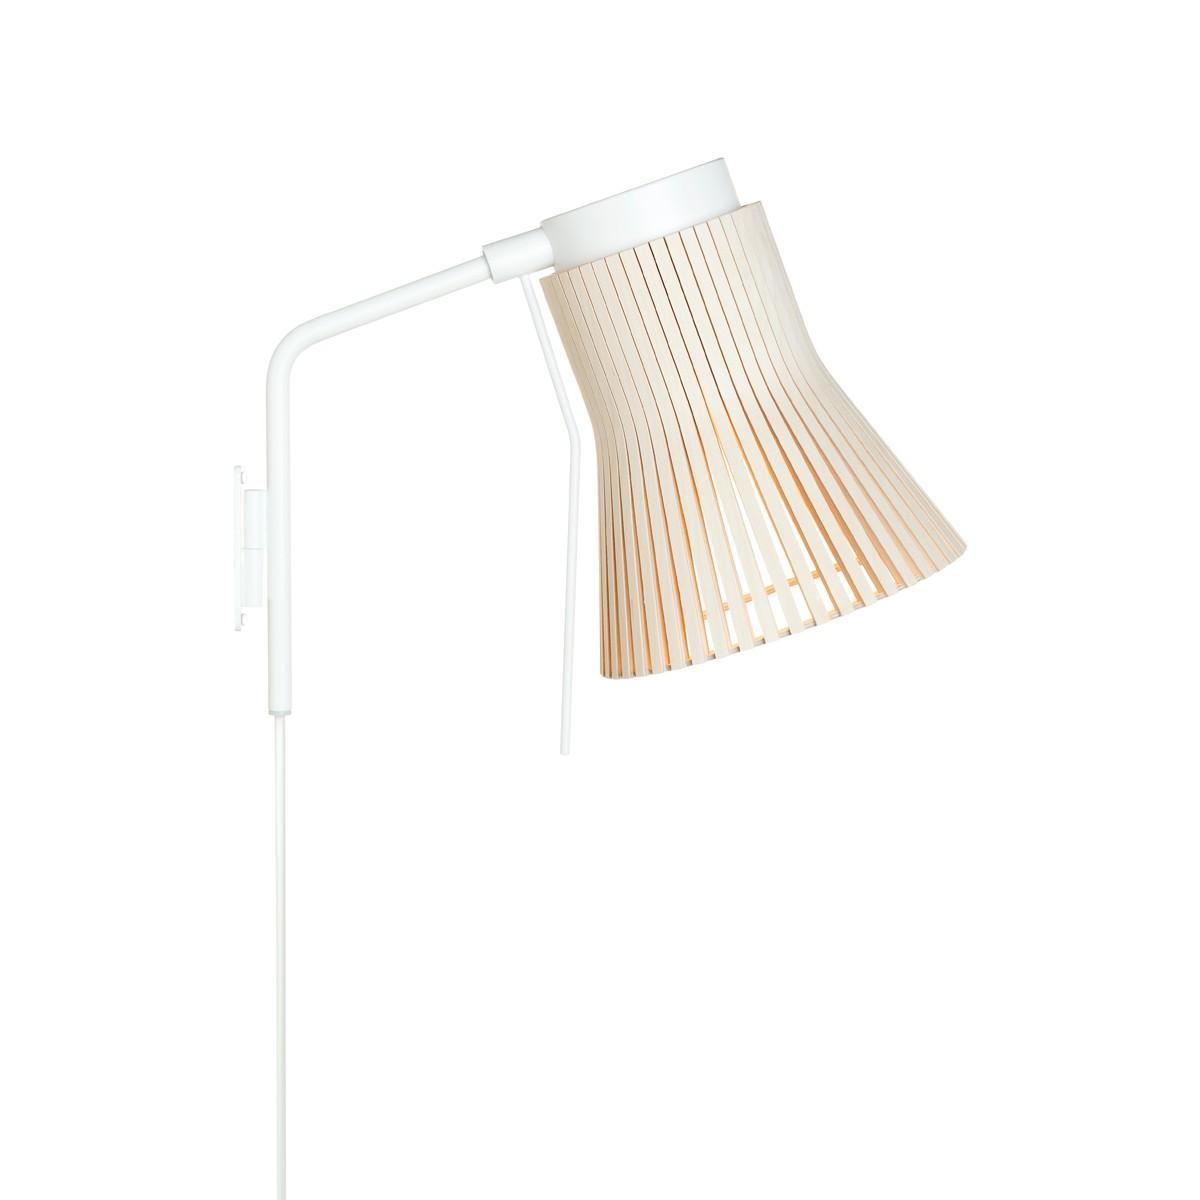 Secto Design Petite 4630 Wandleuchte, weiß, Schirm: Birke natur